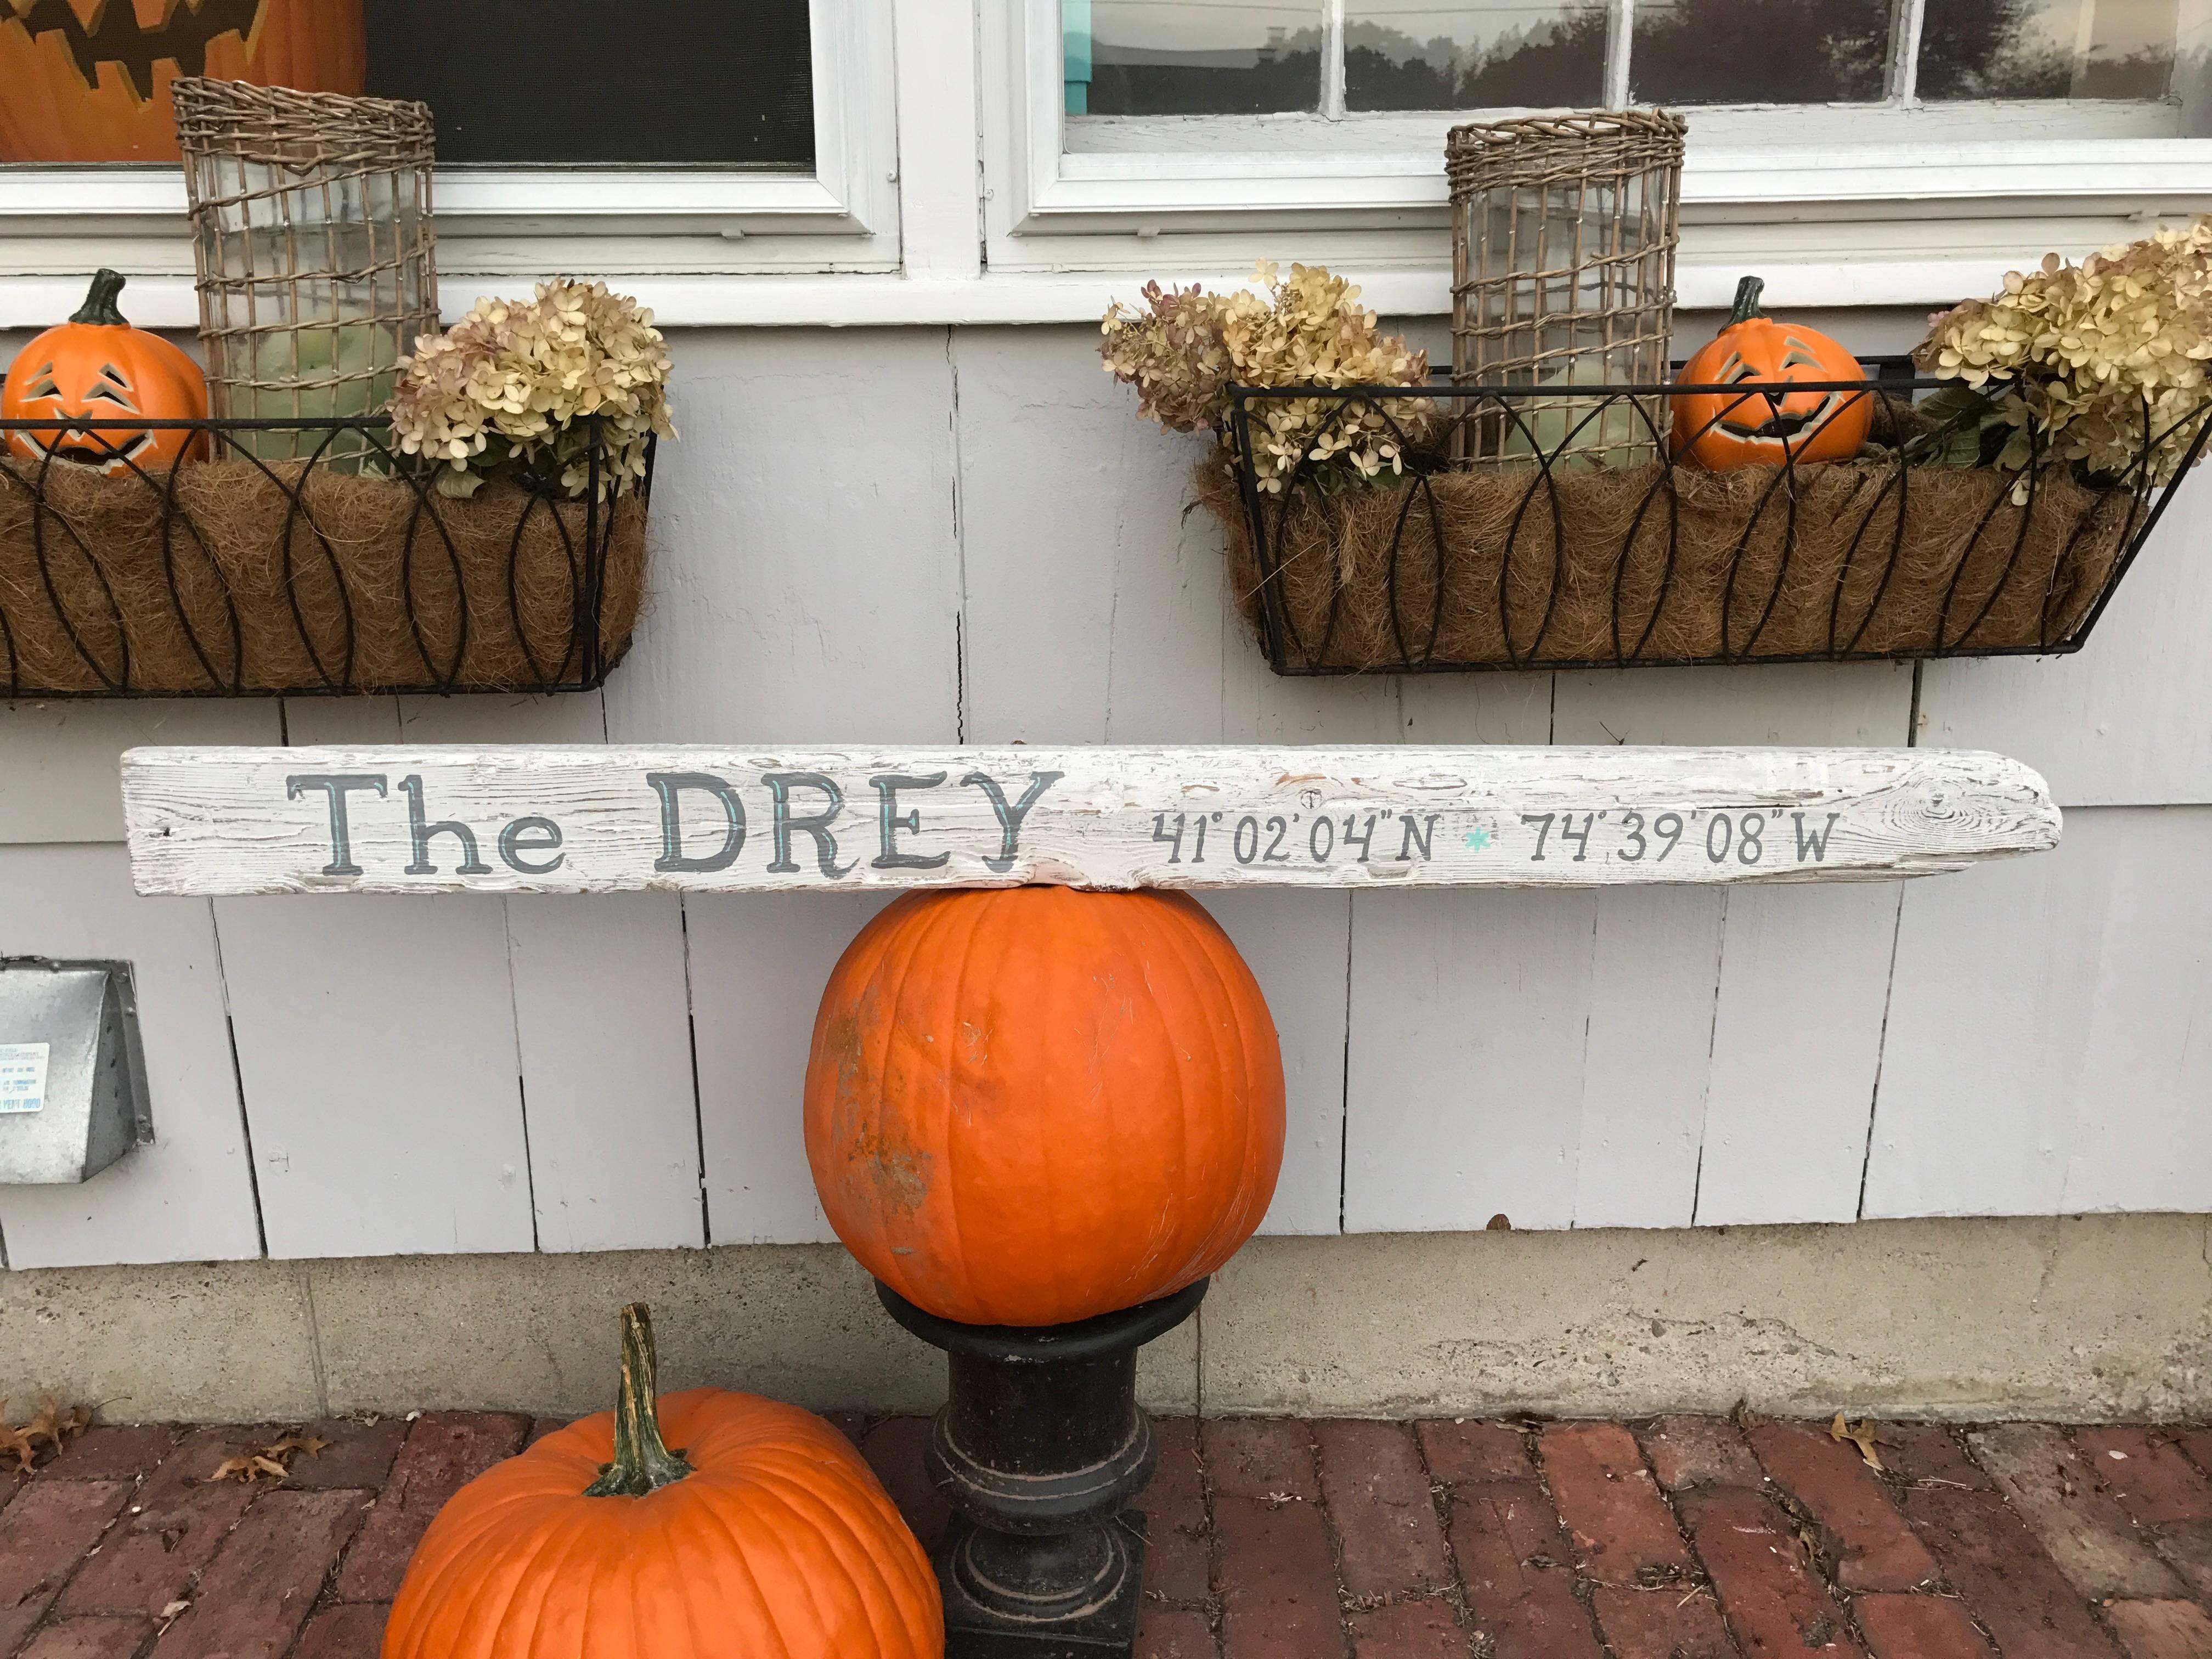 The Drey